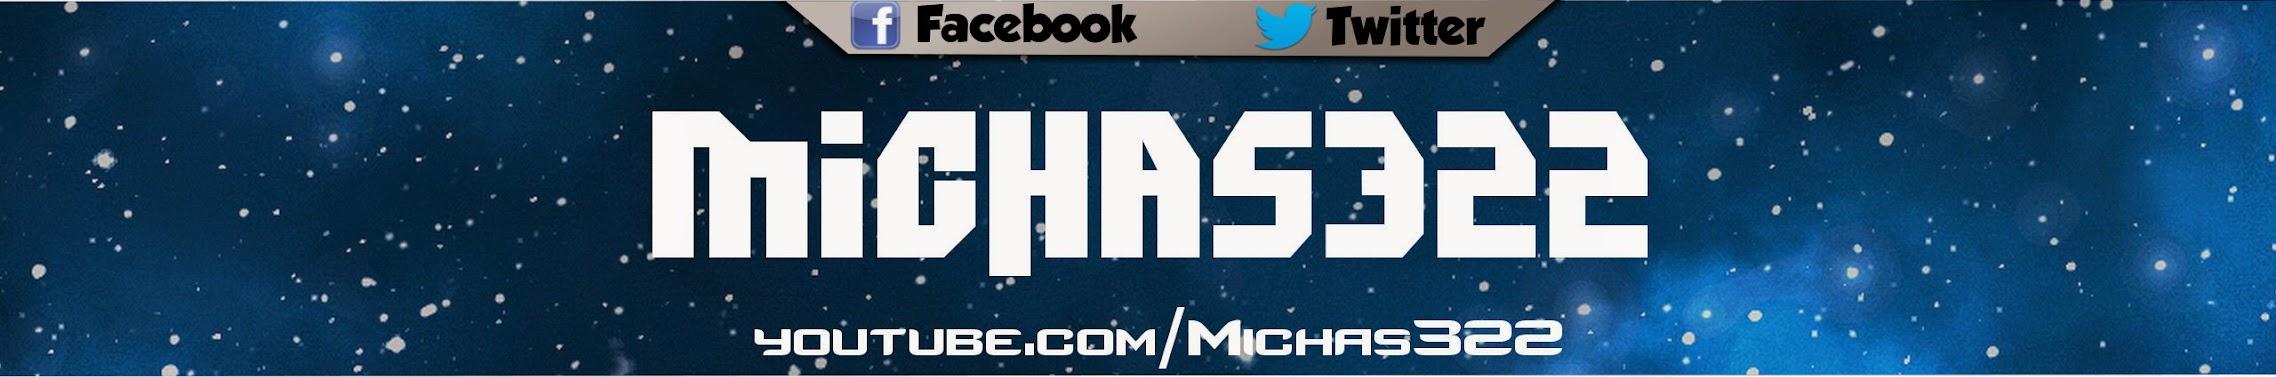 Michas322